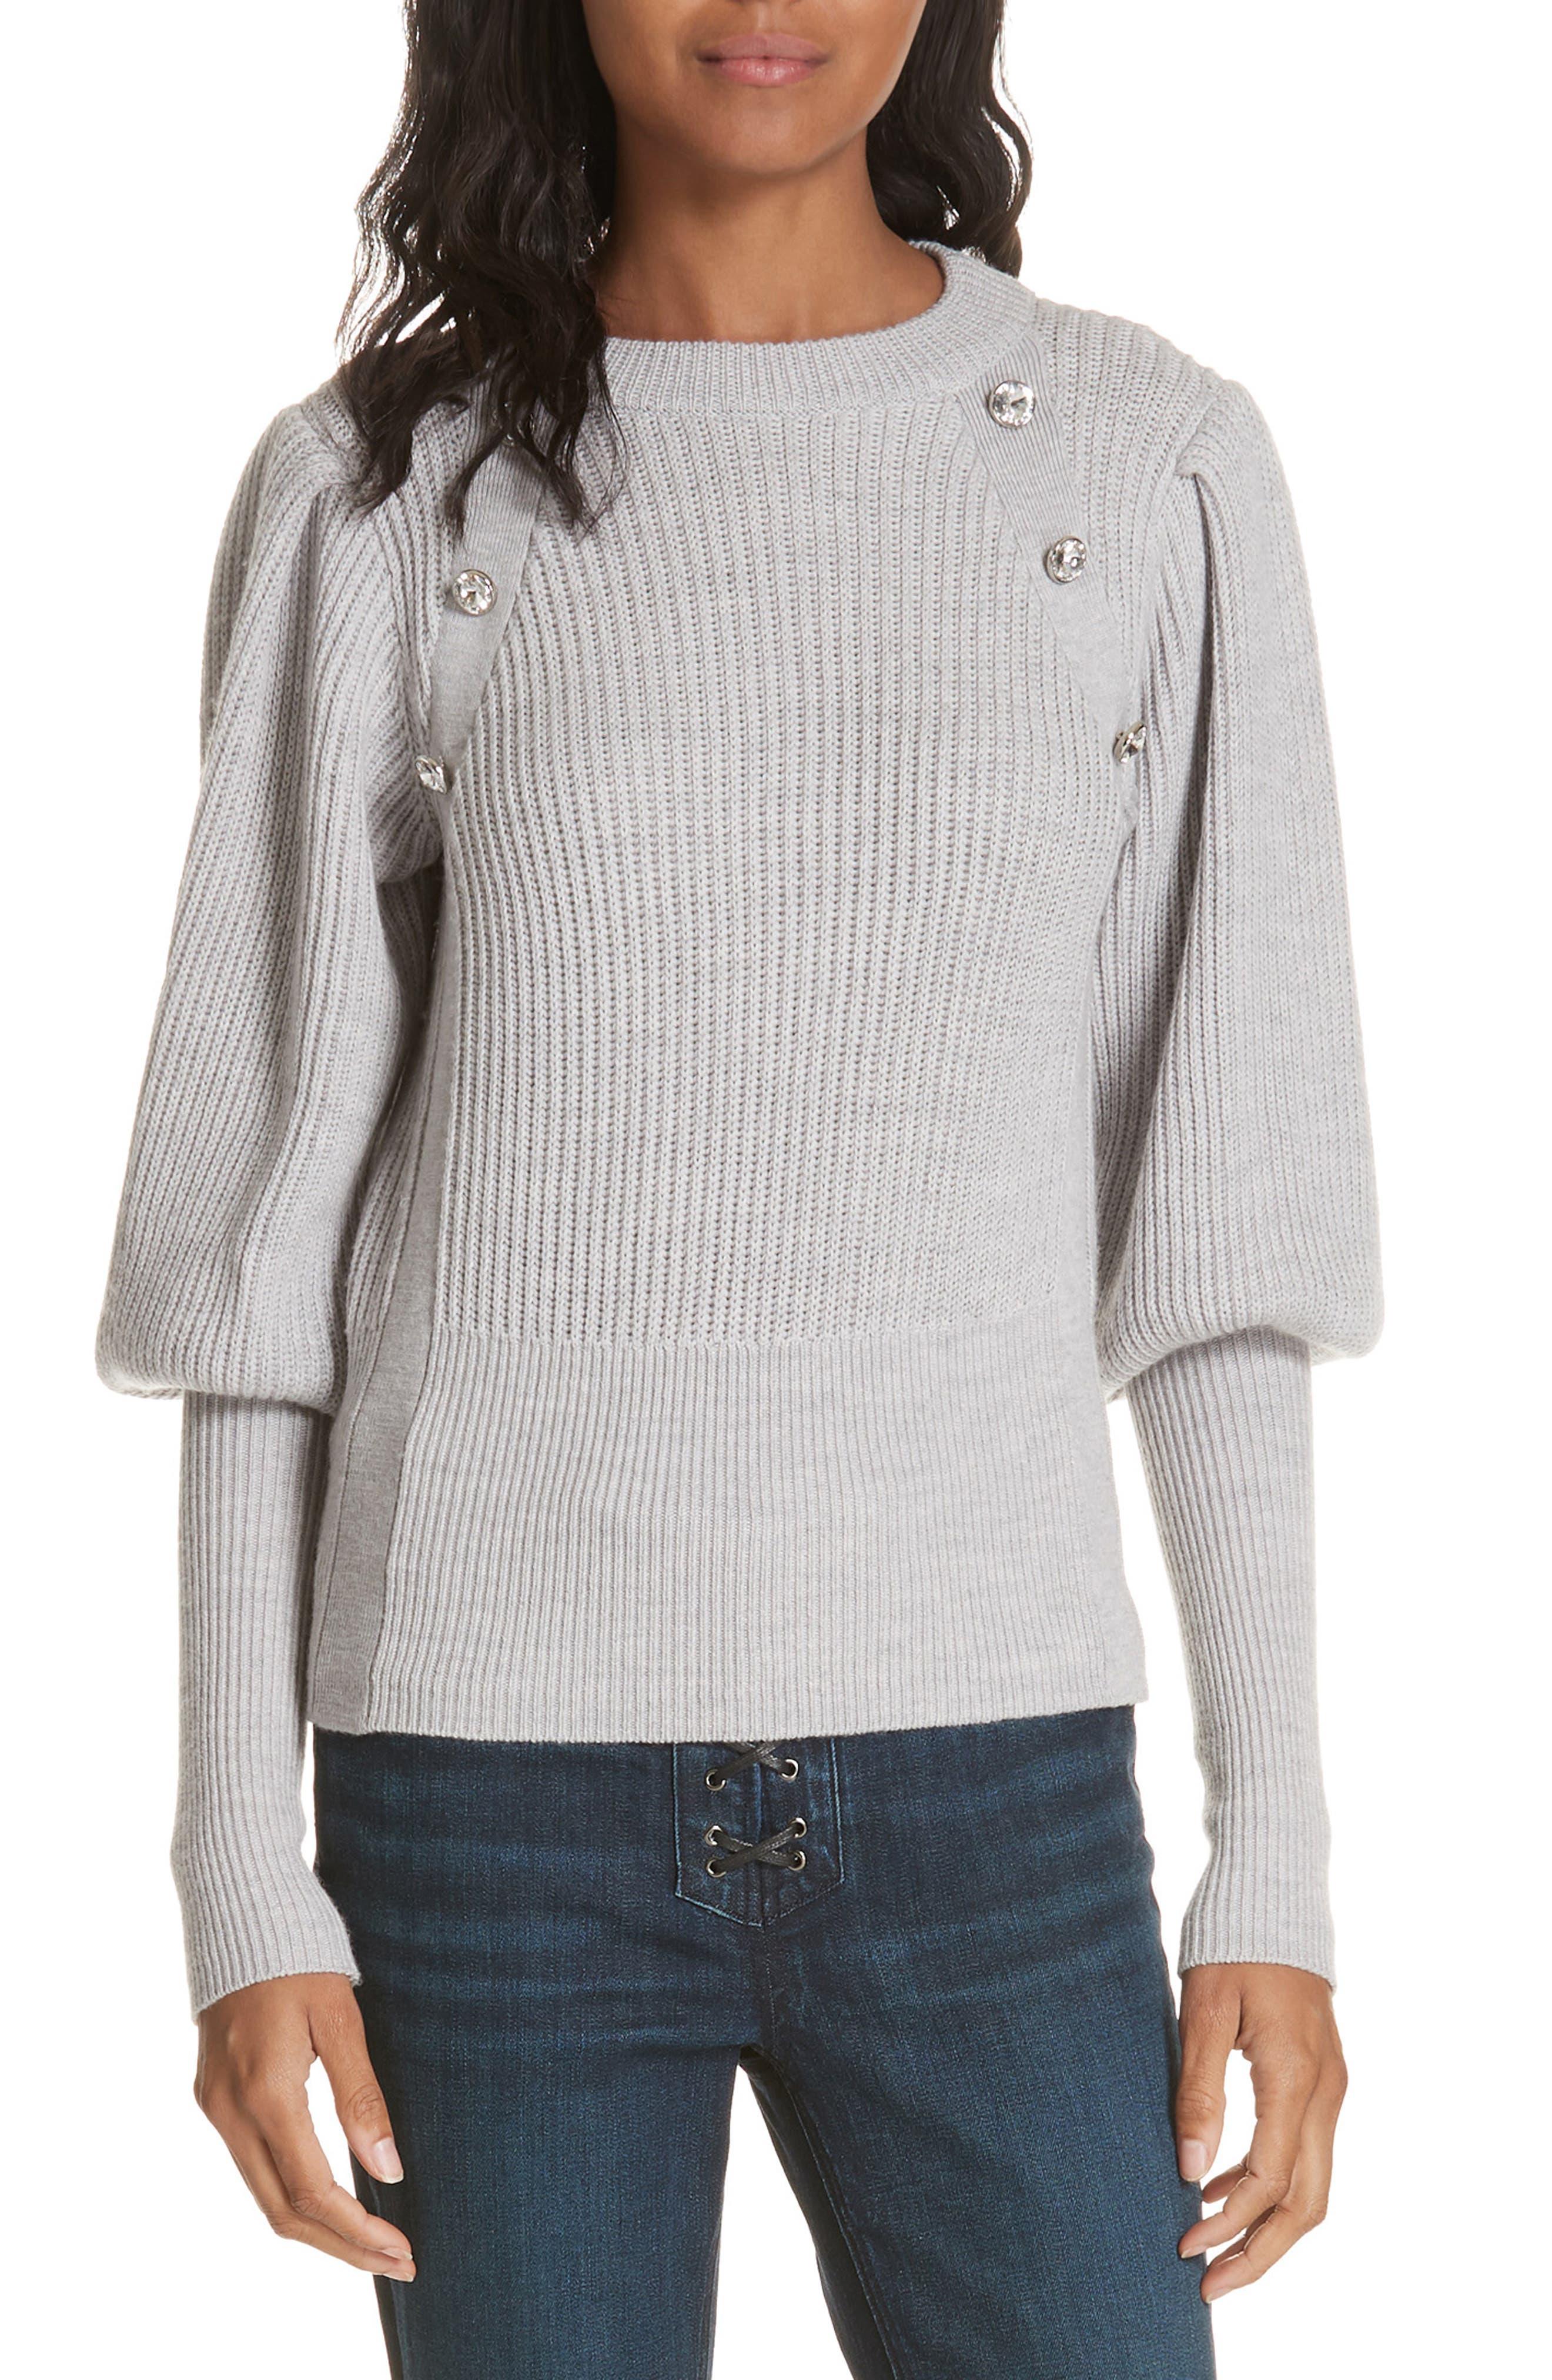 Jude Crystal Button Merino Wool Sweater, Main, color, LIGHT GREY